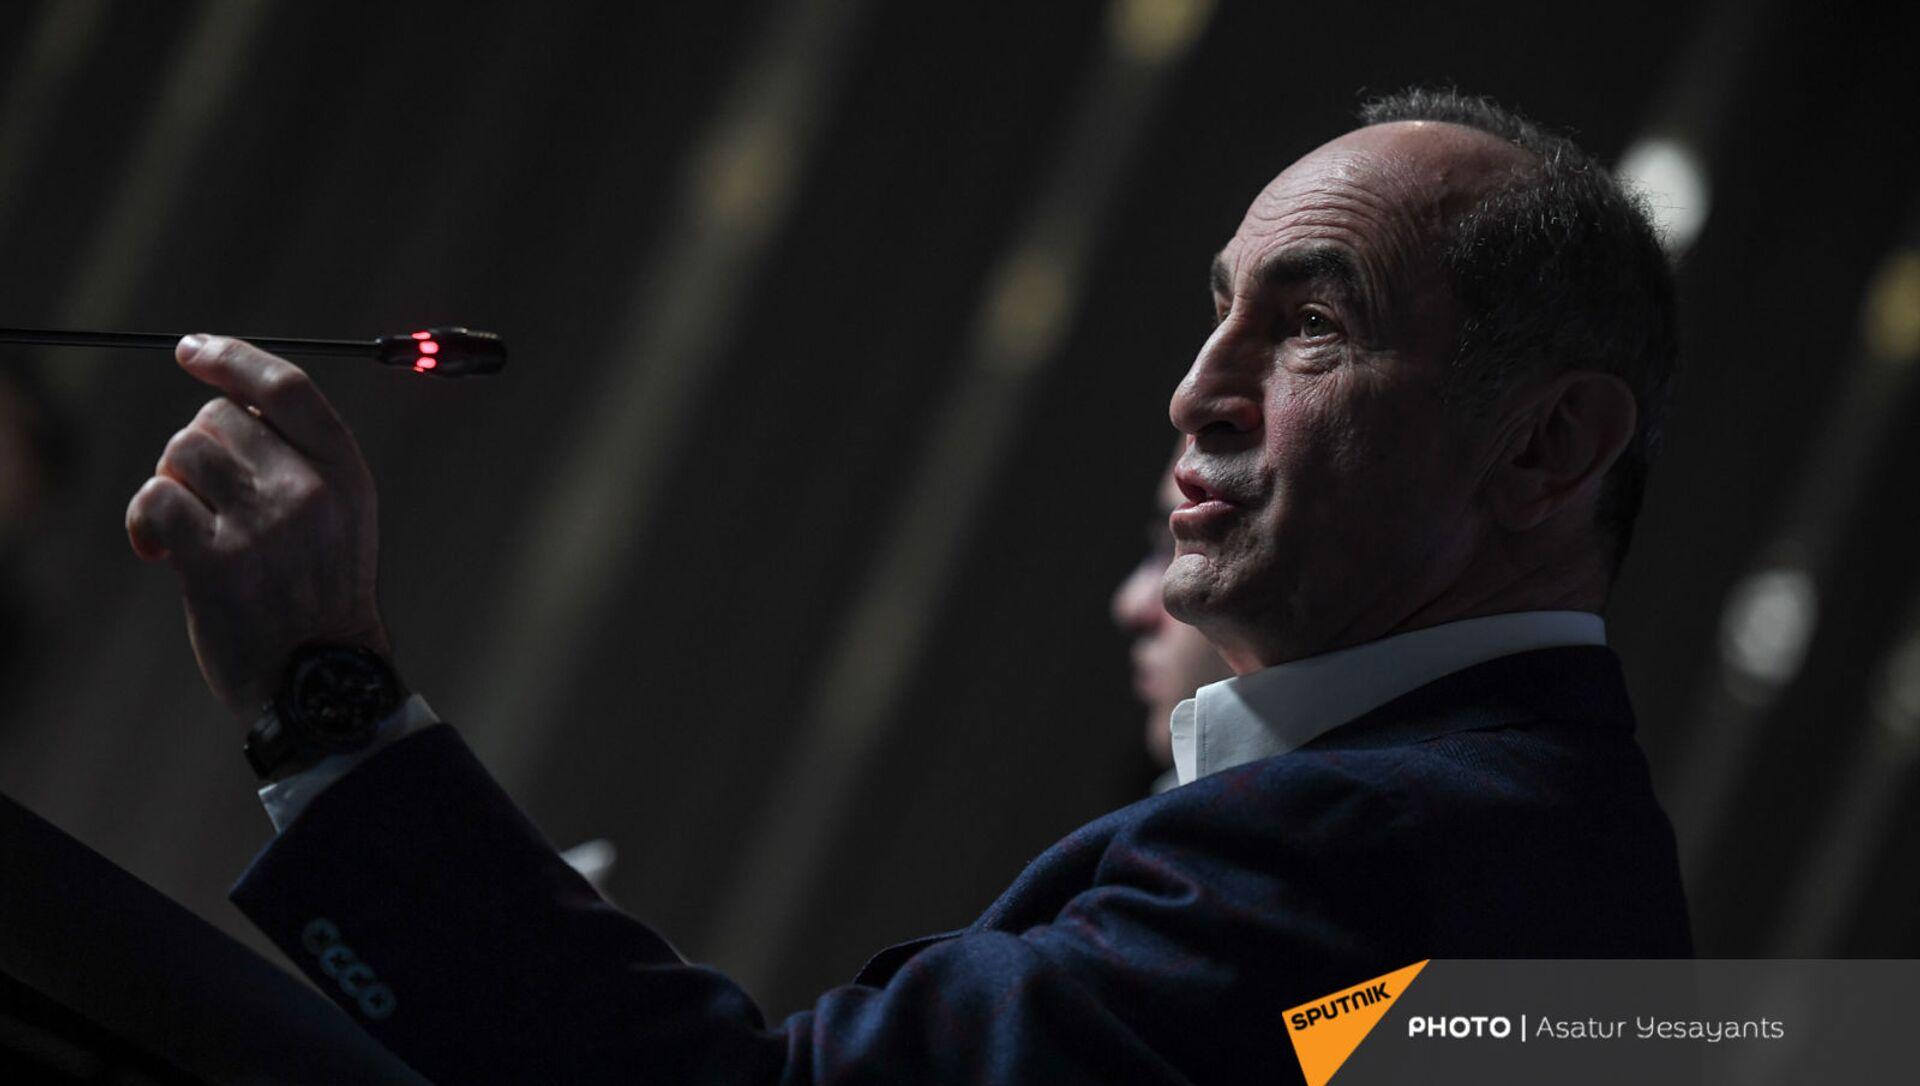 Пресс-конференция второго президента Армении Роберта Кочаряна для российских журналистов (4 марта 2021). Еревaн - Sputnik Արմենիա, 1920, 05.04.2021